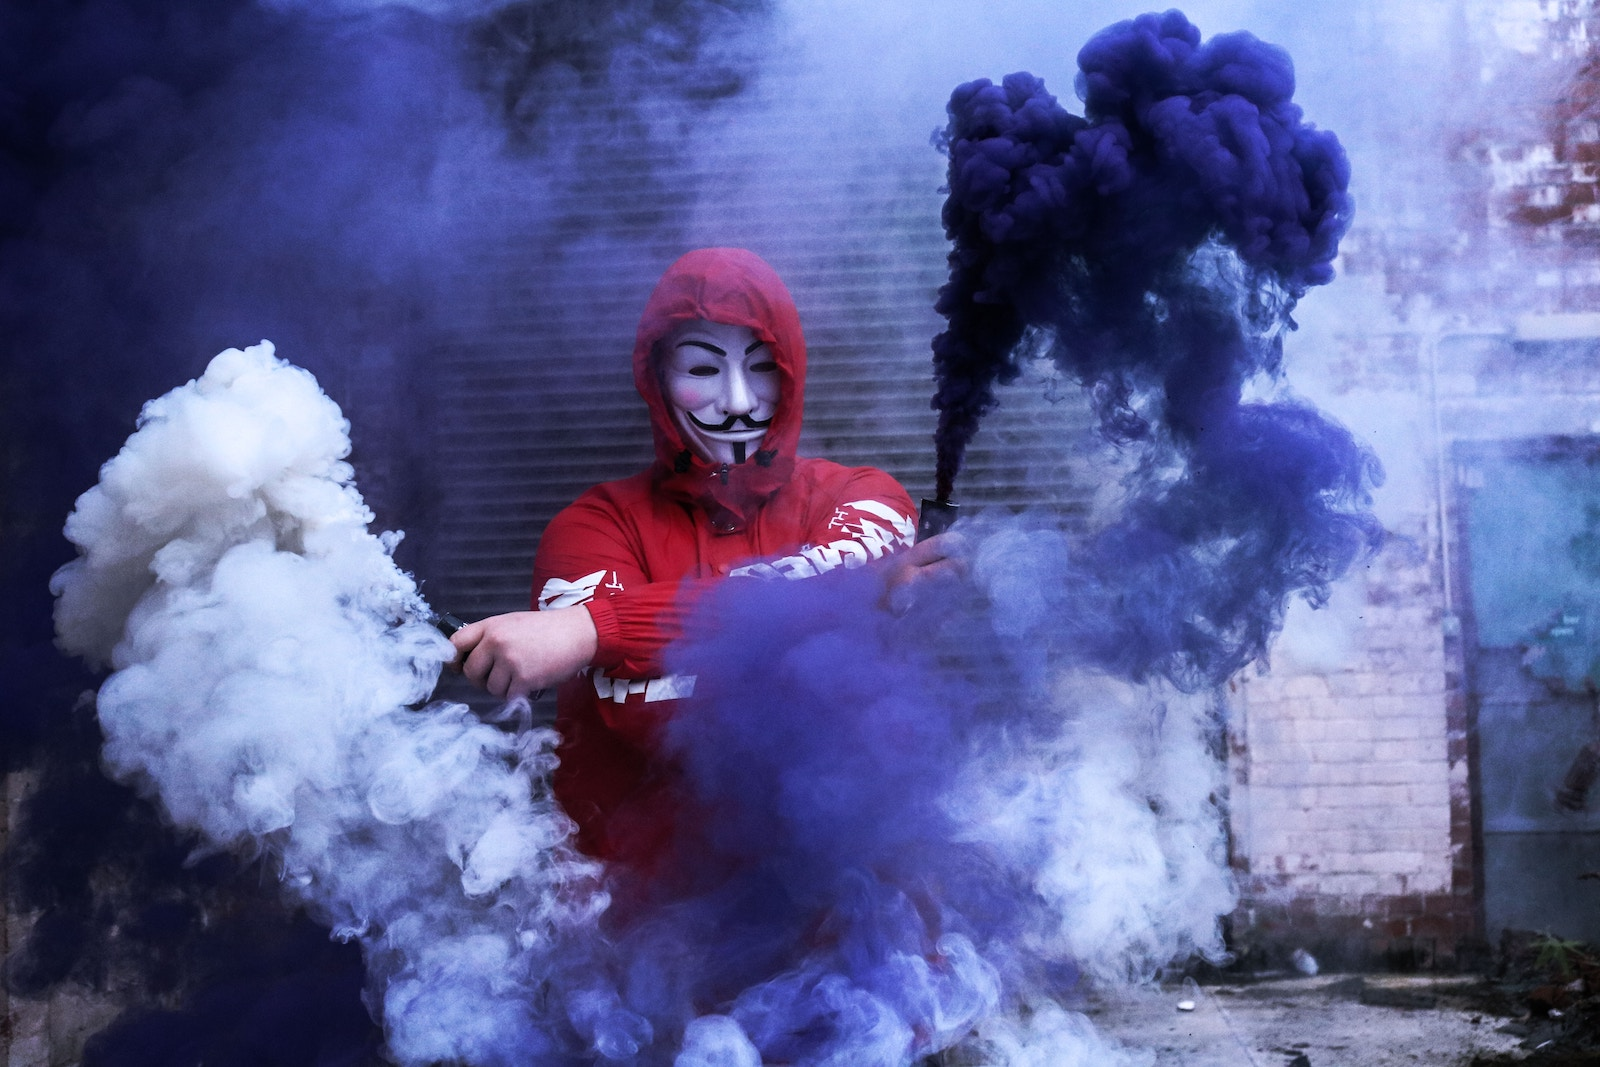 Jak dyzajnerka zatrolyla cile misto na Pivdni Ukraїny